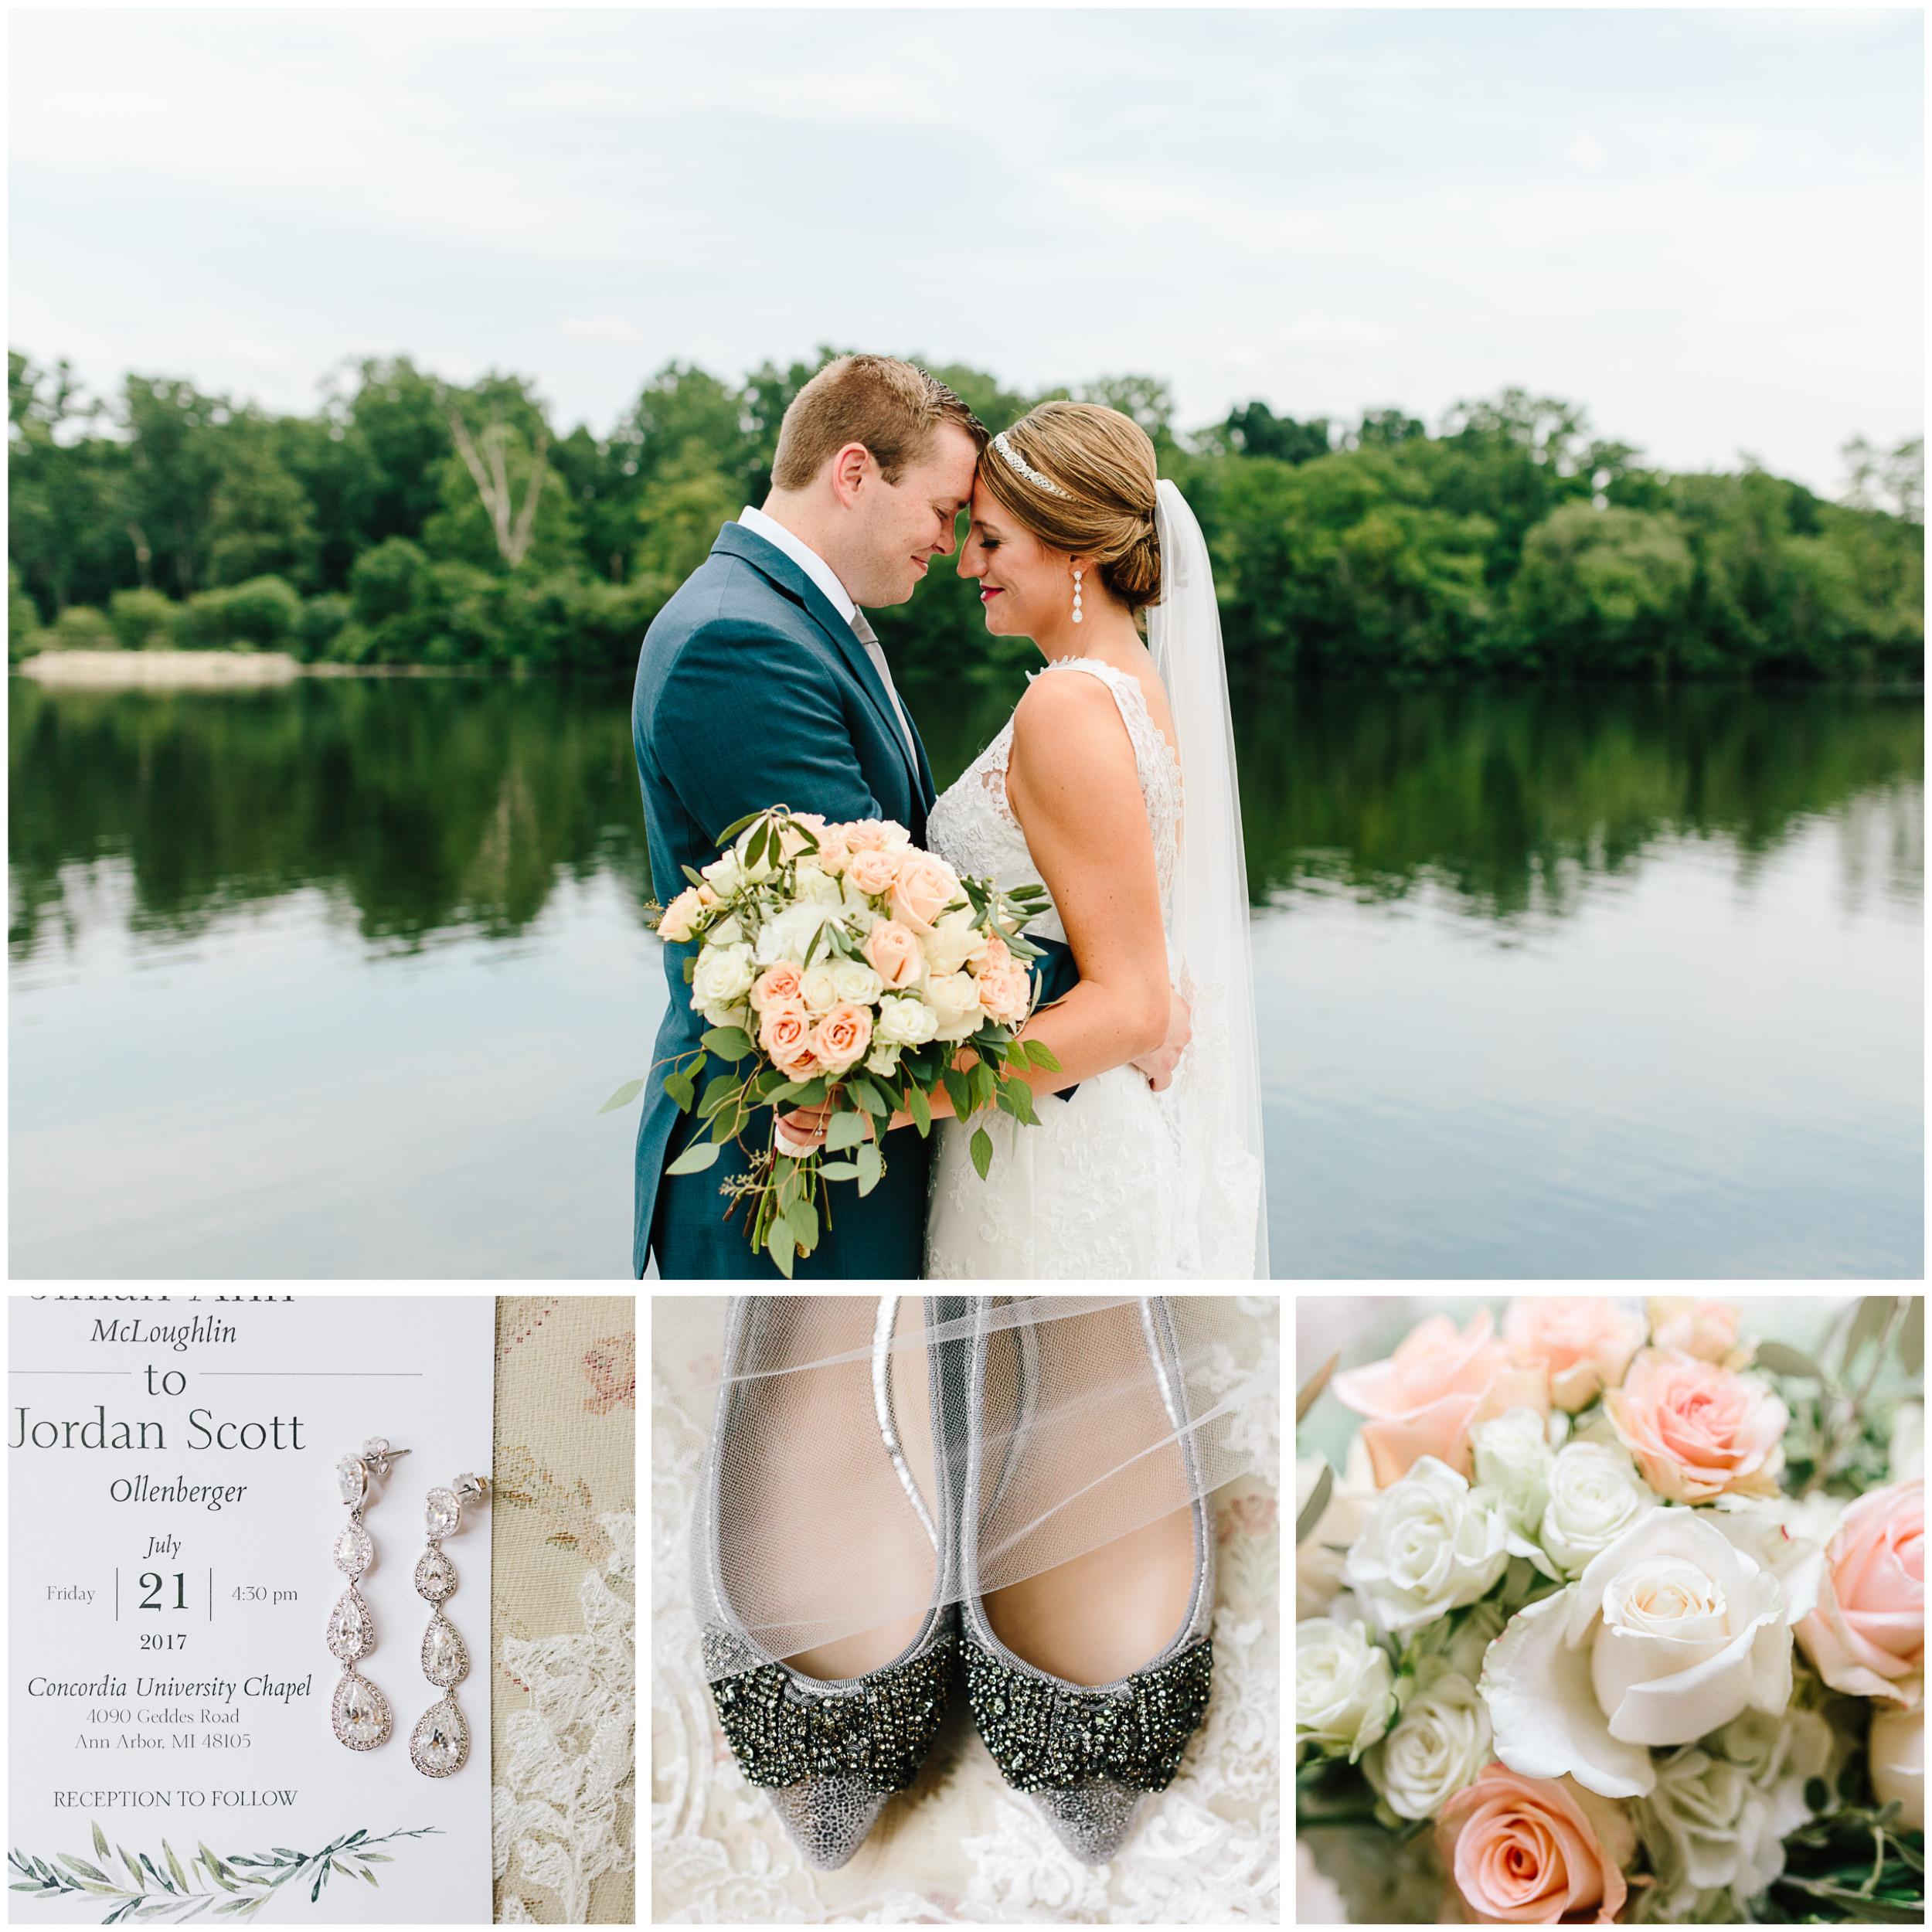 ann_arbor_michigan_wedding_header.jpg